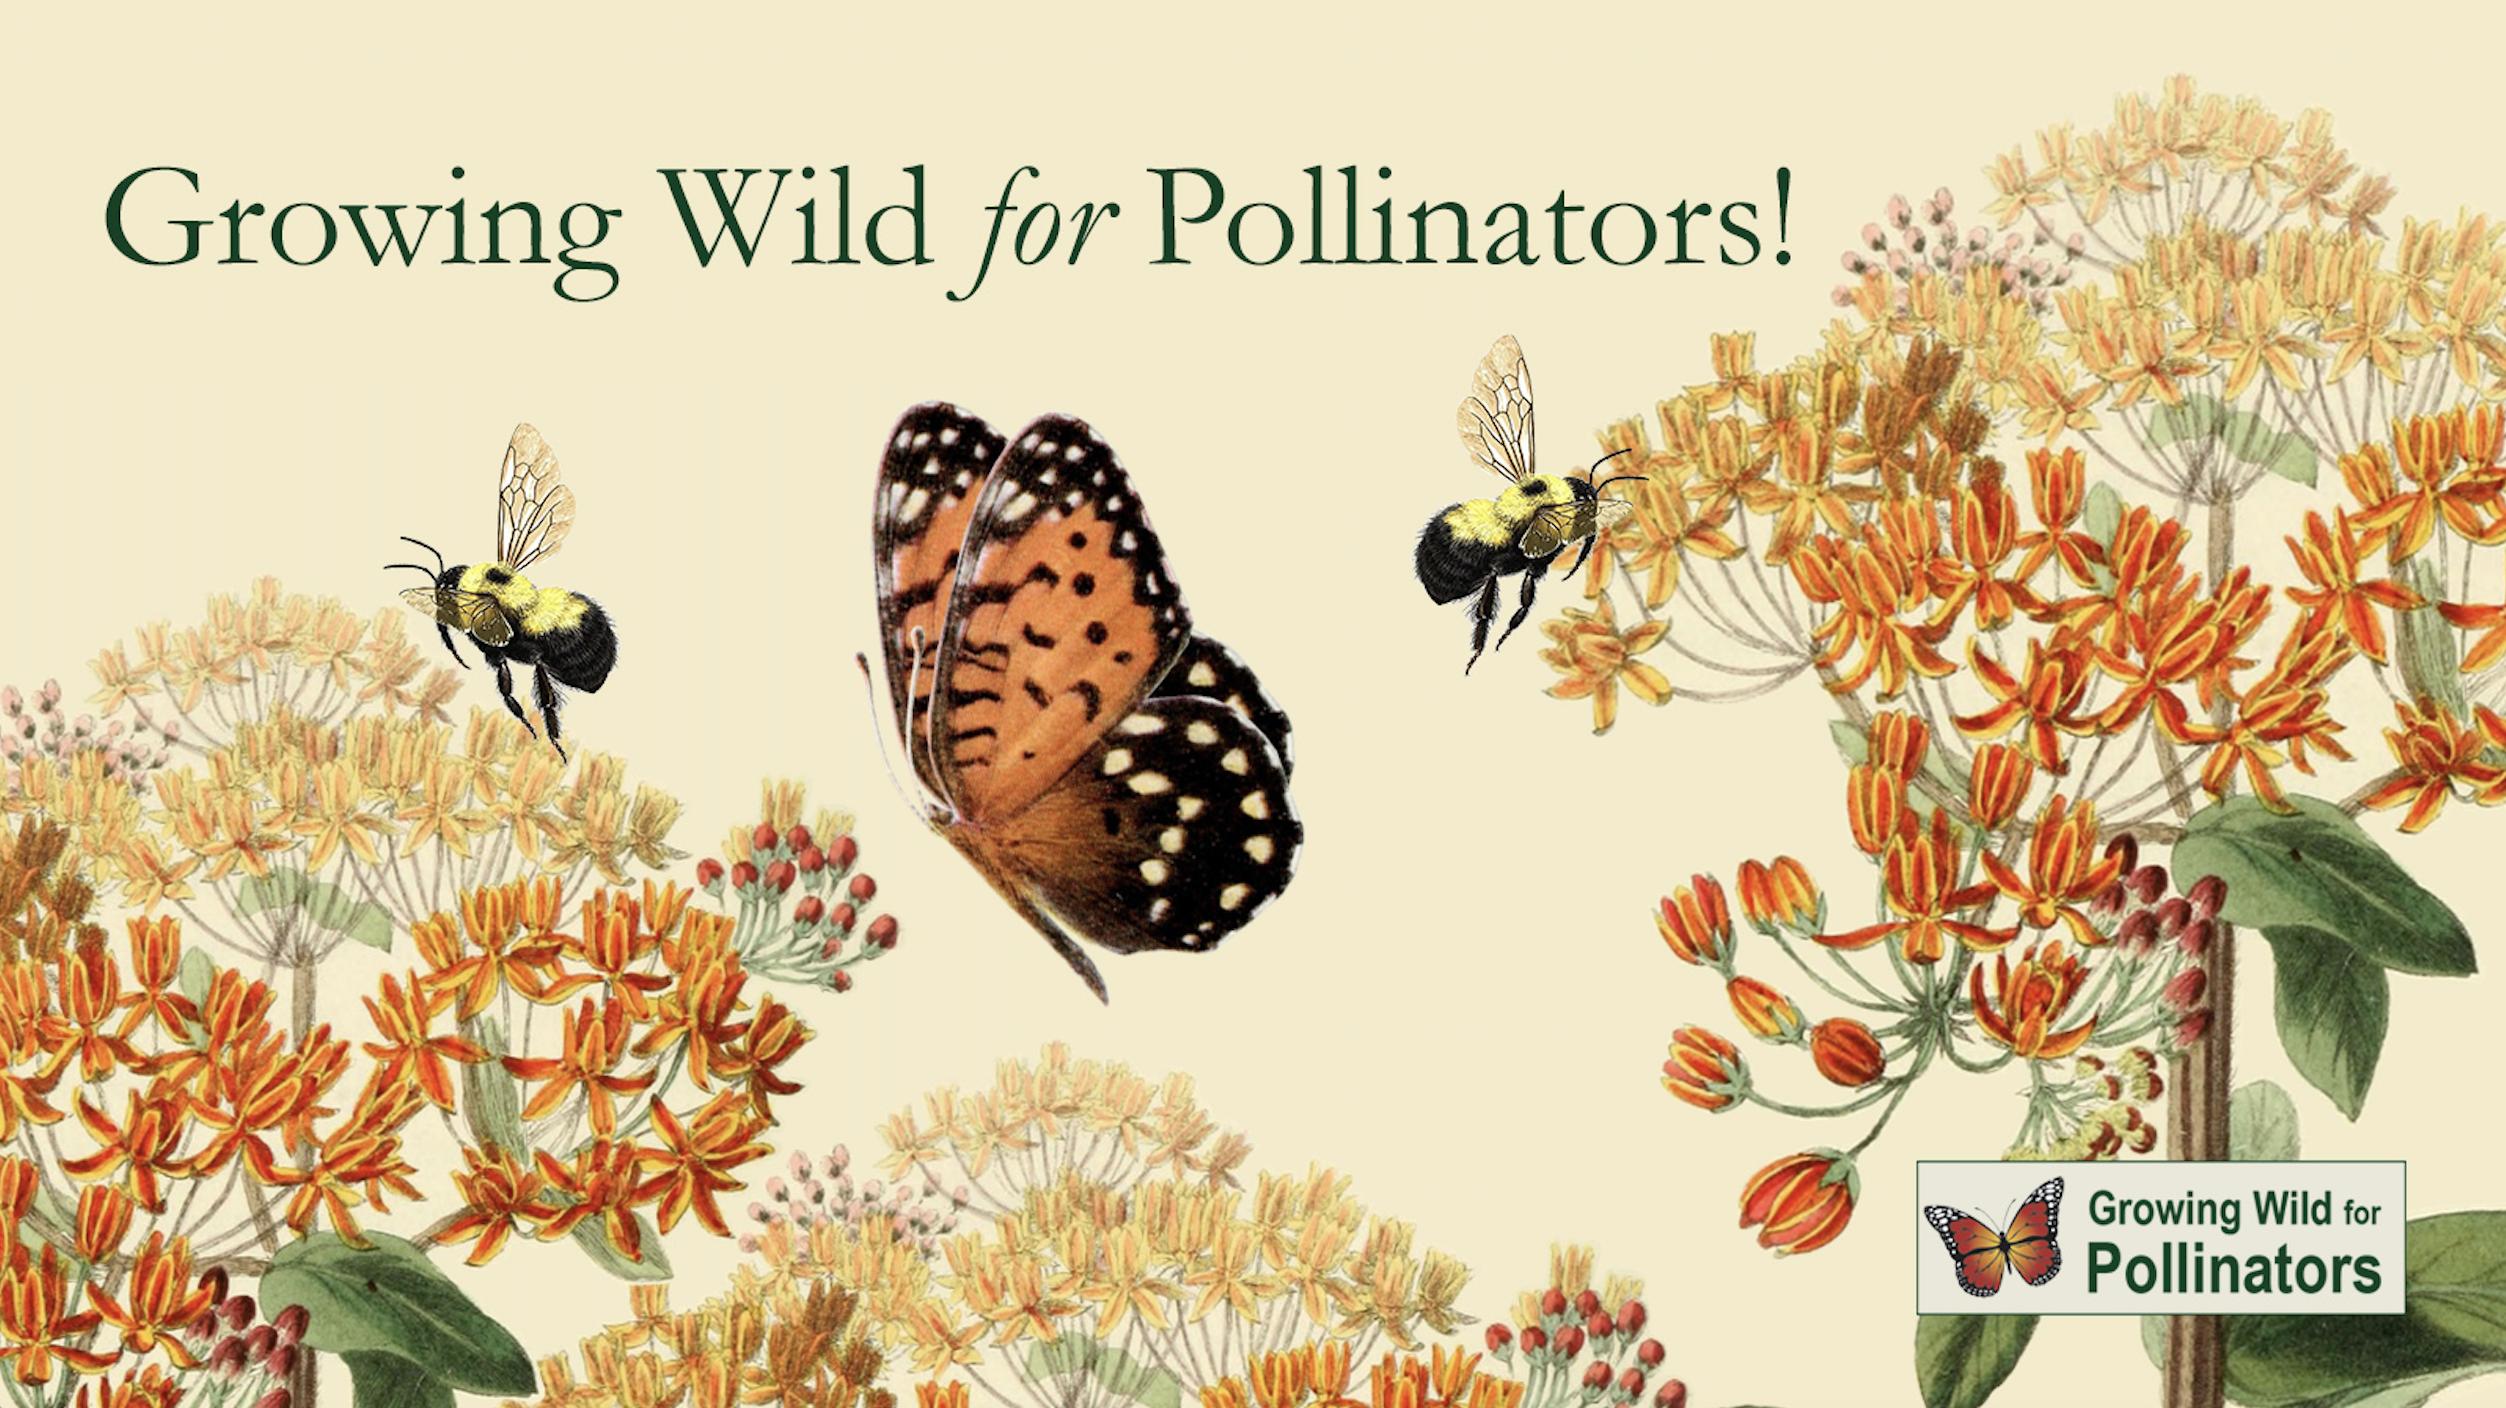 Growing Wild for Pollinators Massachusetts